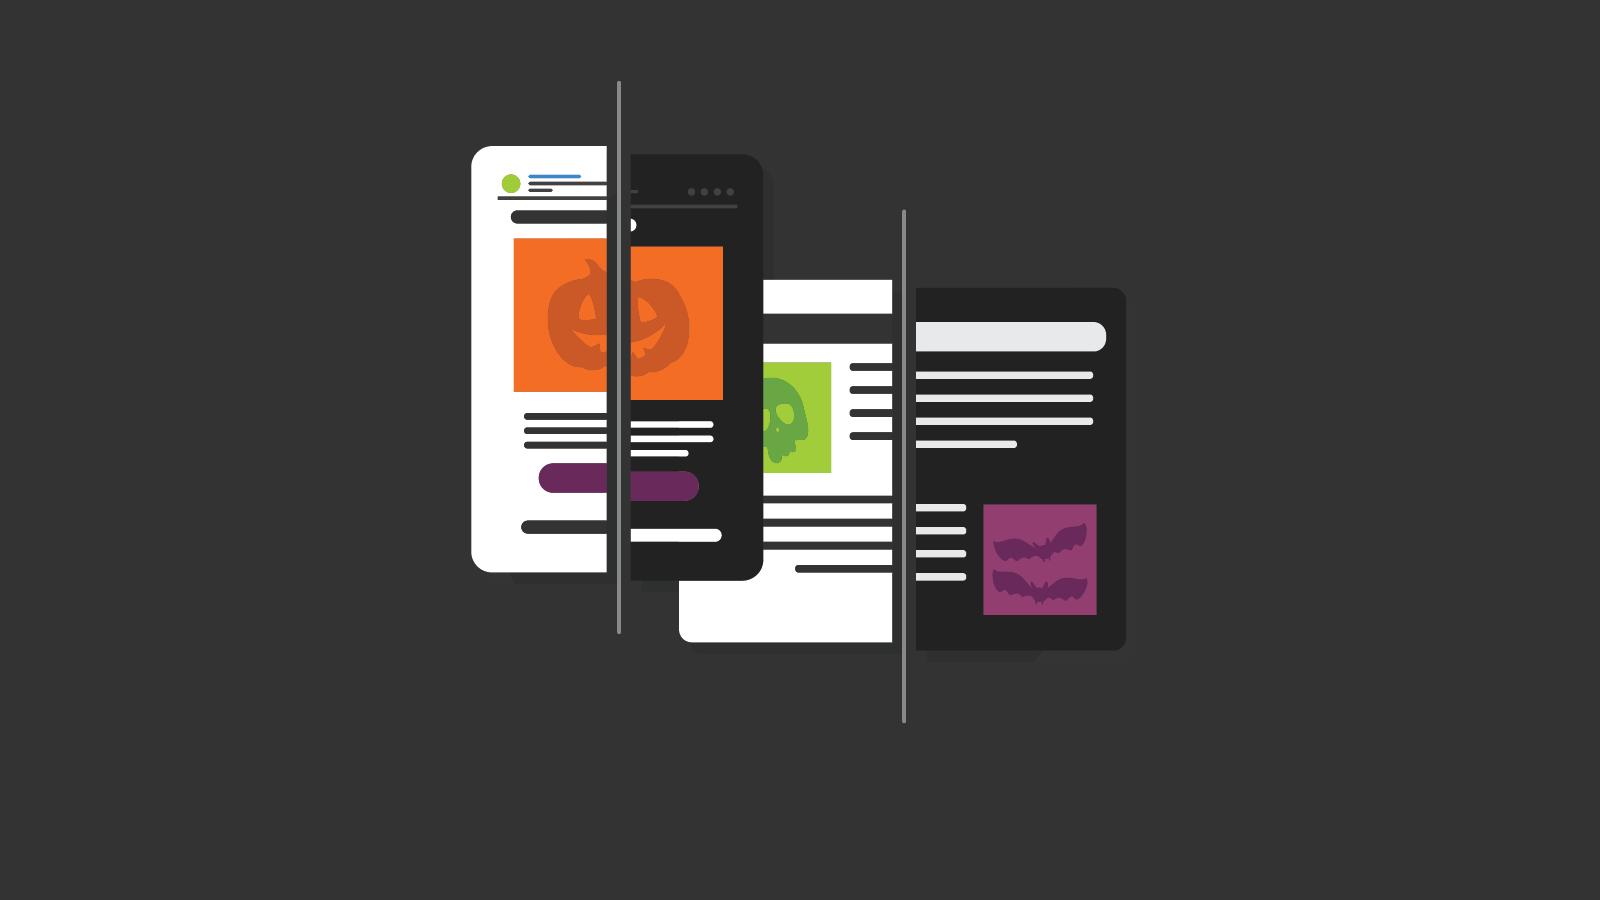 graphic of dark mode vs light mode user interfaces